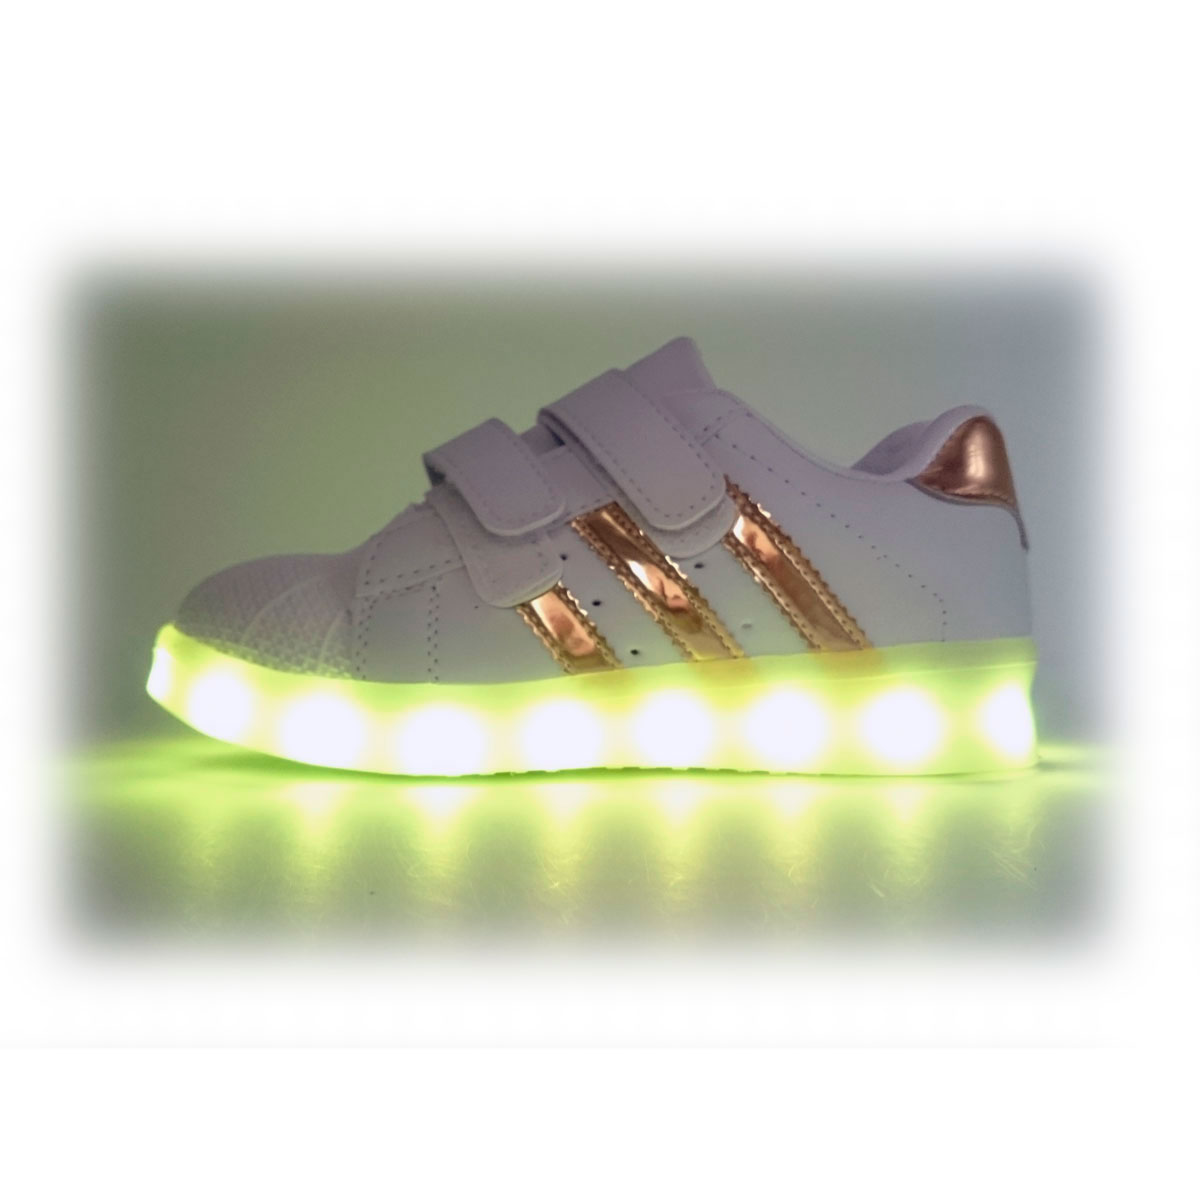 a3d73d611912 ... фото main Светящиеся кроссовки LED superstar золотистые детские на  липучке main